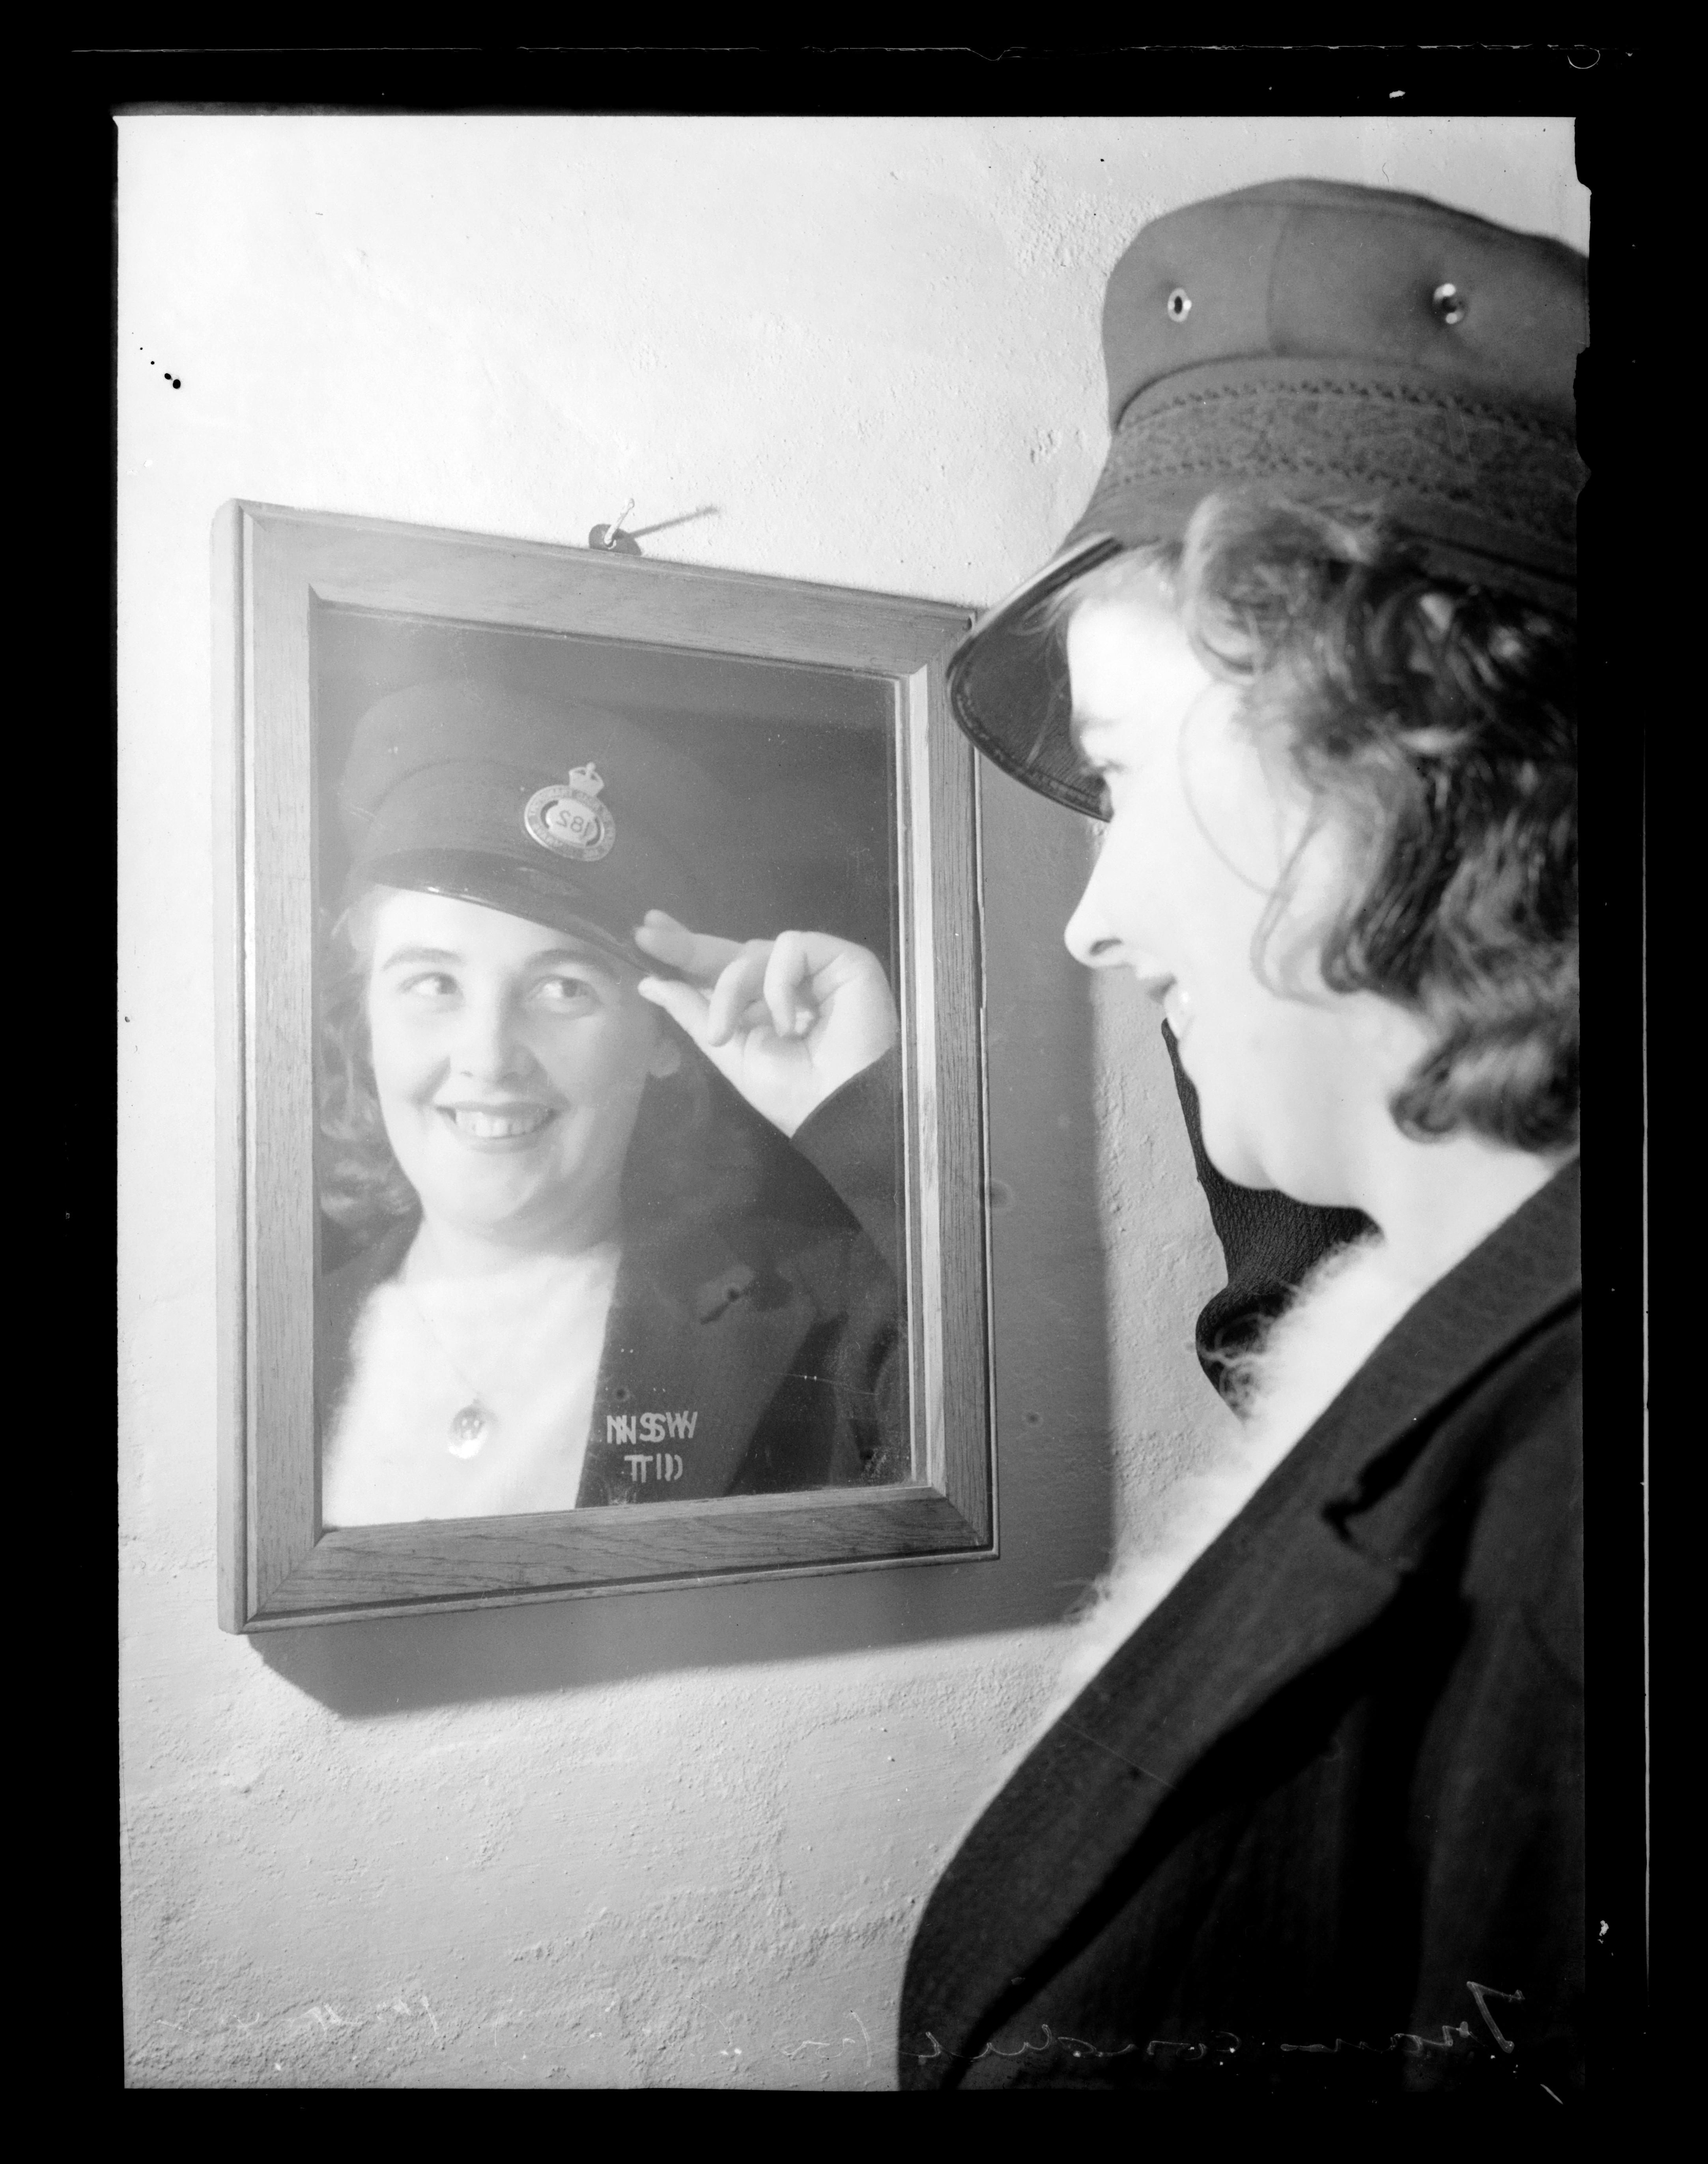 K. Davis - Tramwoman at work [and other tram photographs], 1933-1942